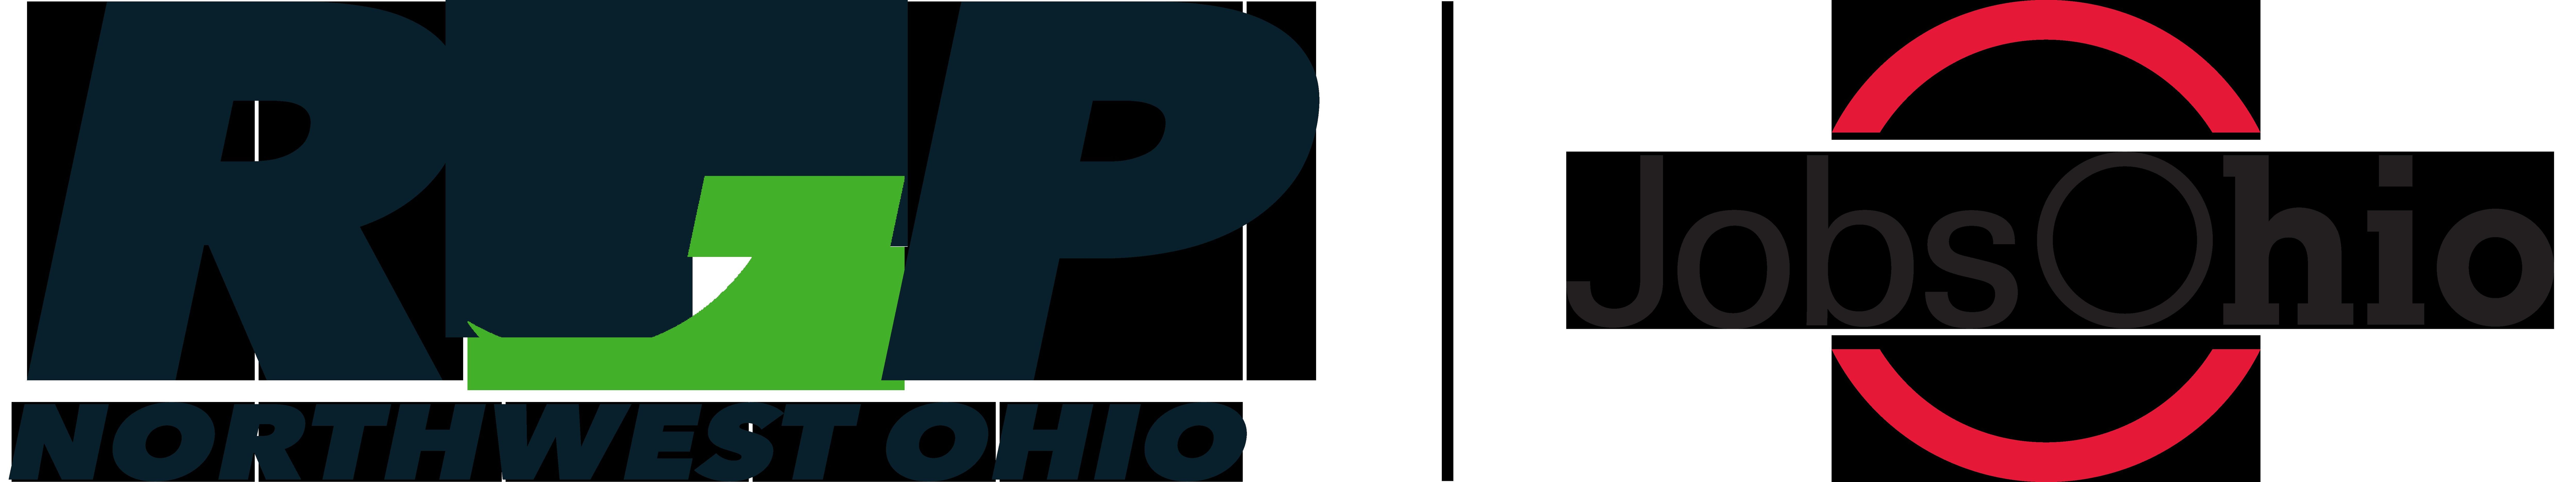 JO_RGP_Logo1